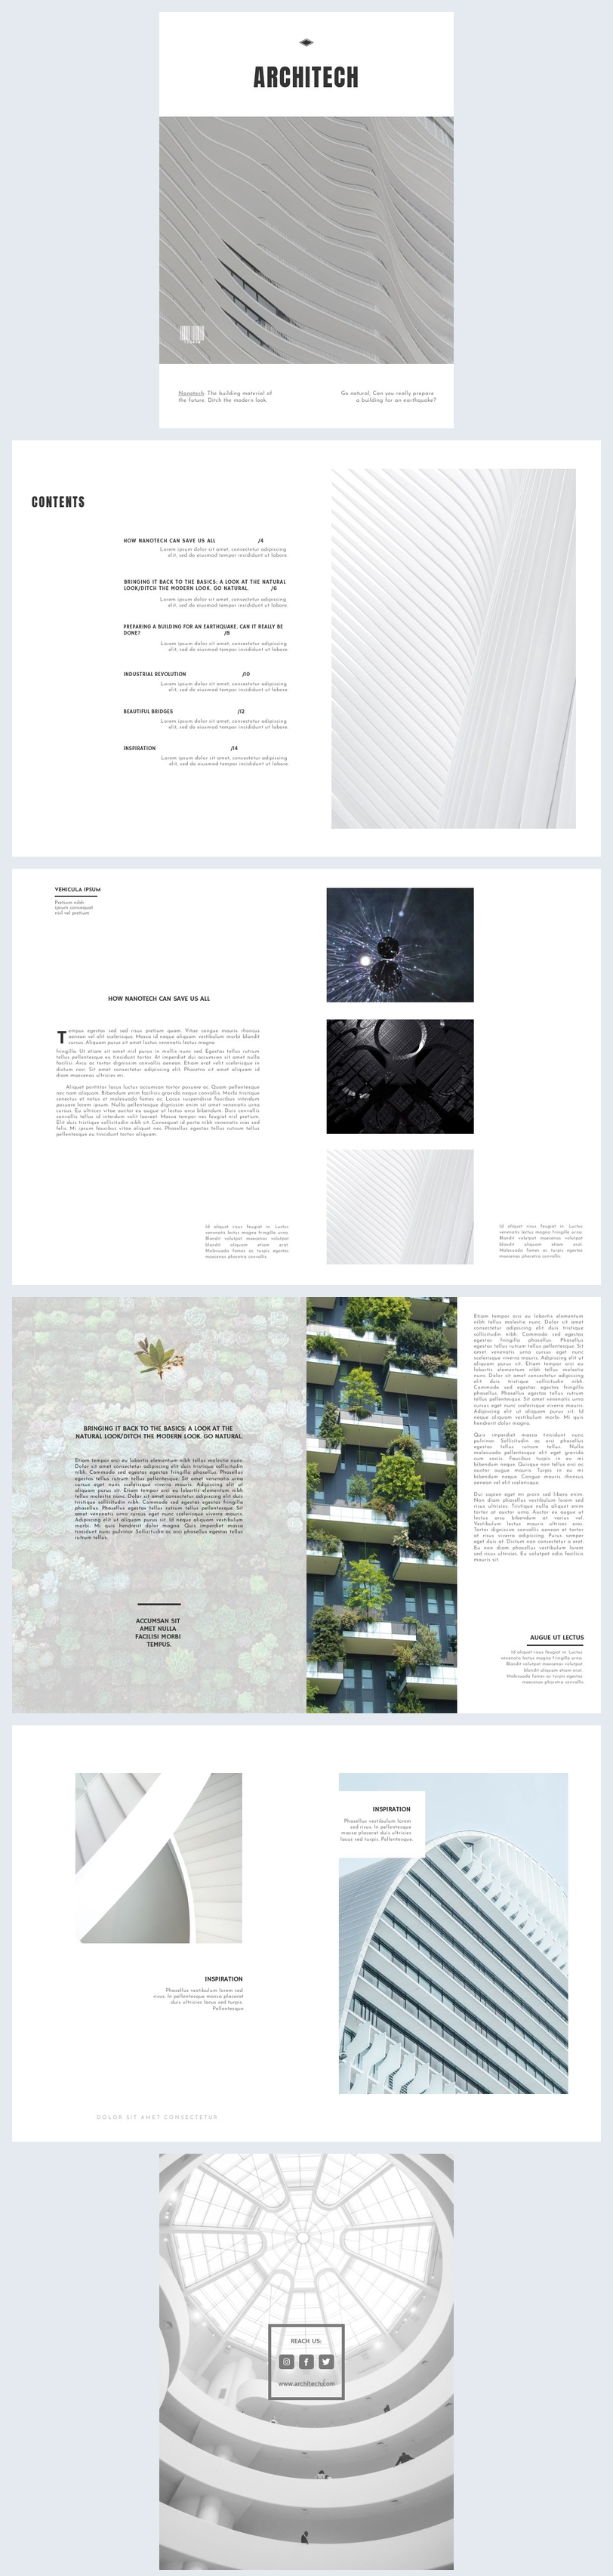 Plantilla para revista de arquitectura